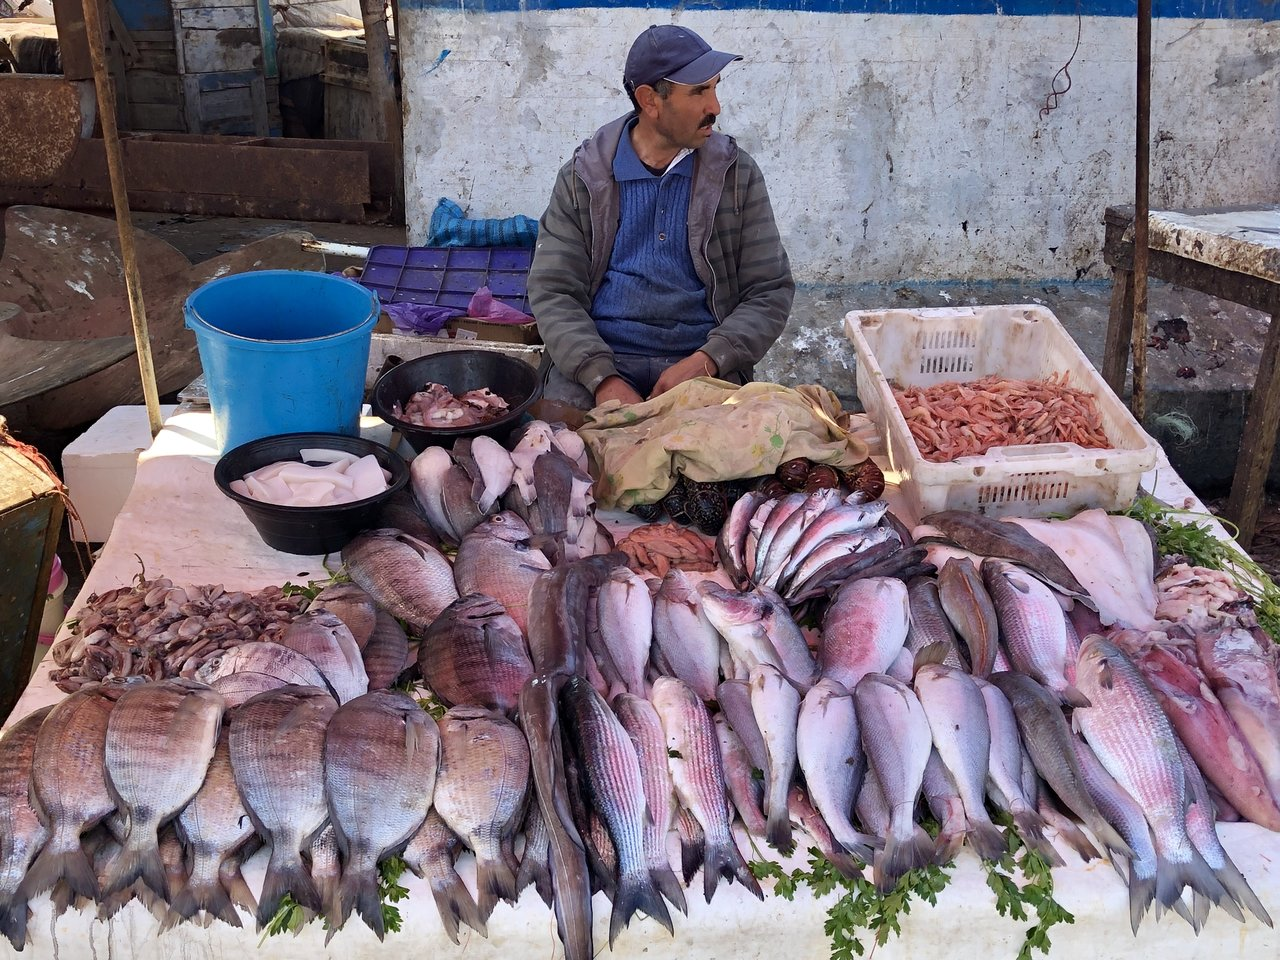 Fish market  | Photo taken by Alta P